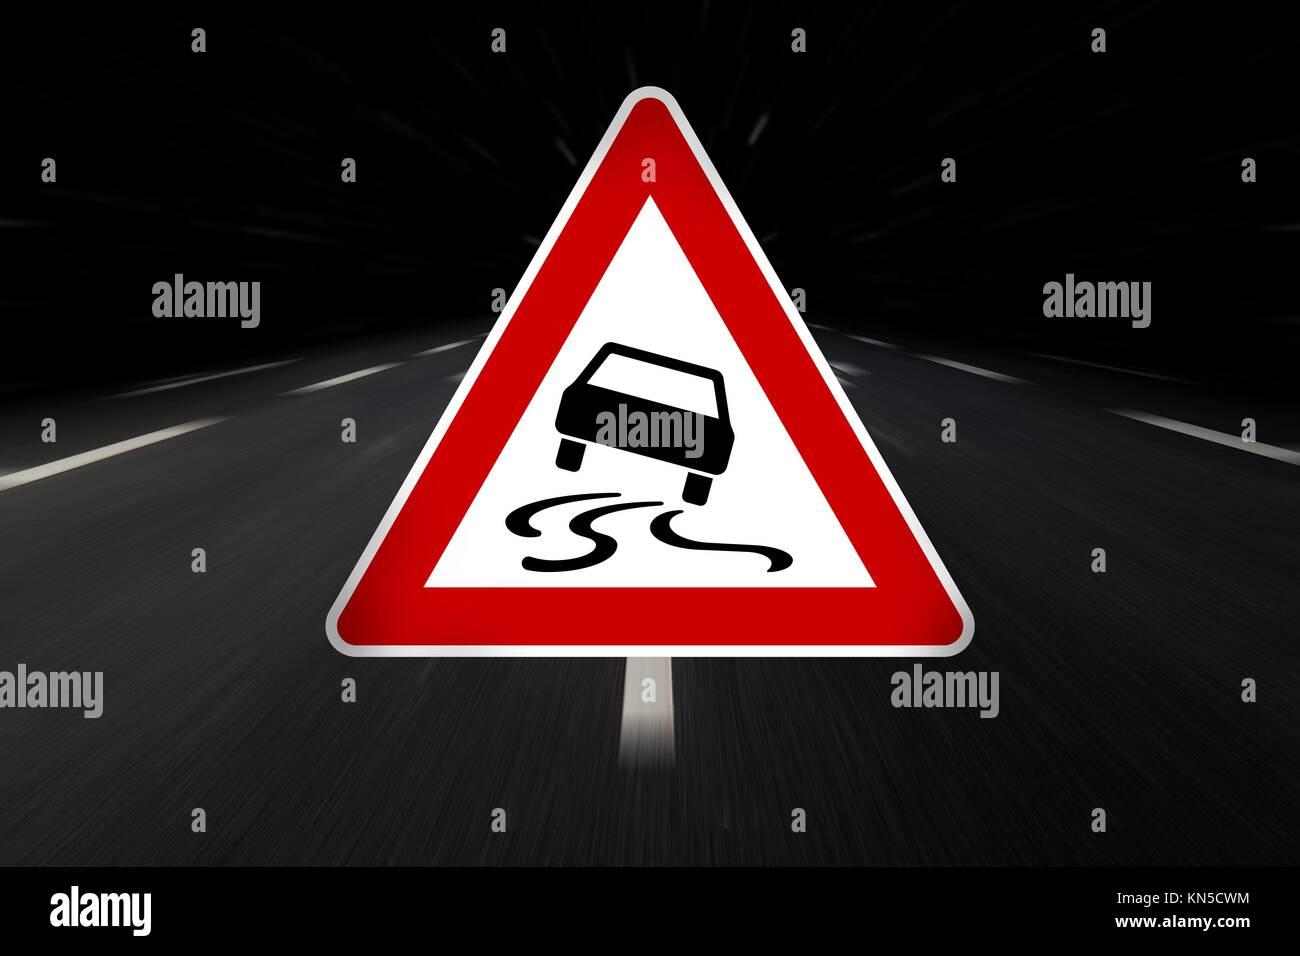 Slip Warnschild auf Asphalt. Stockbild